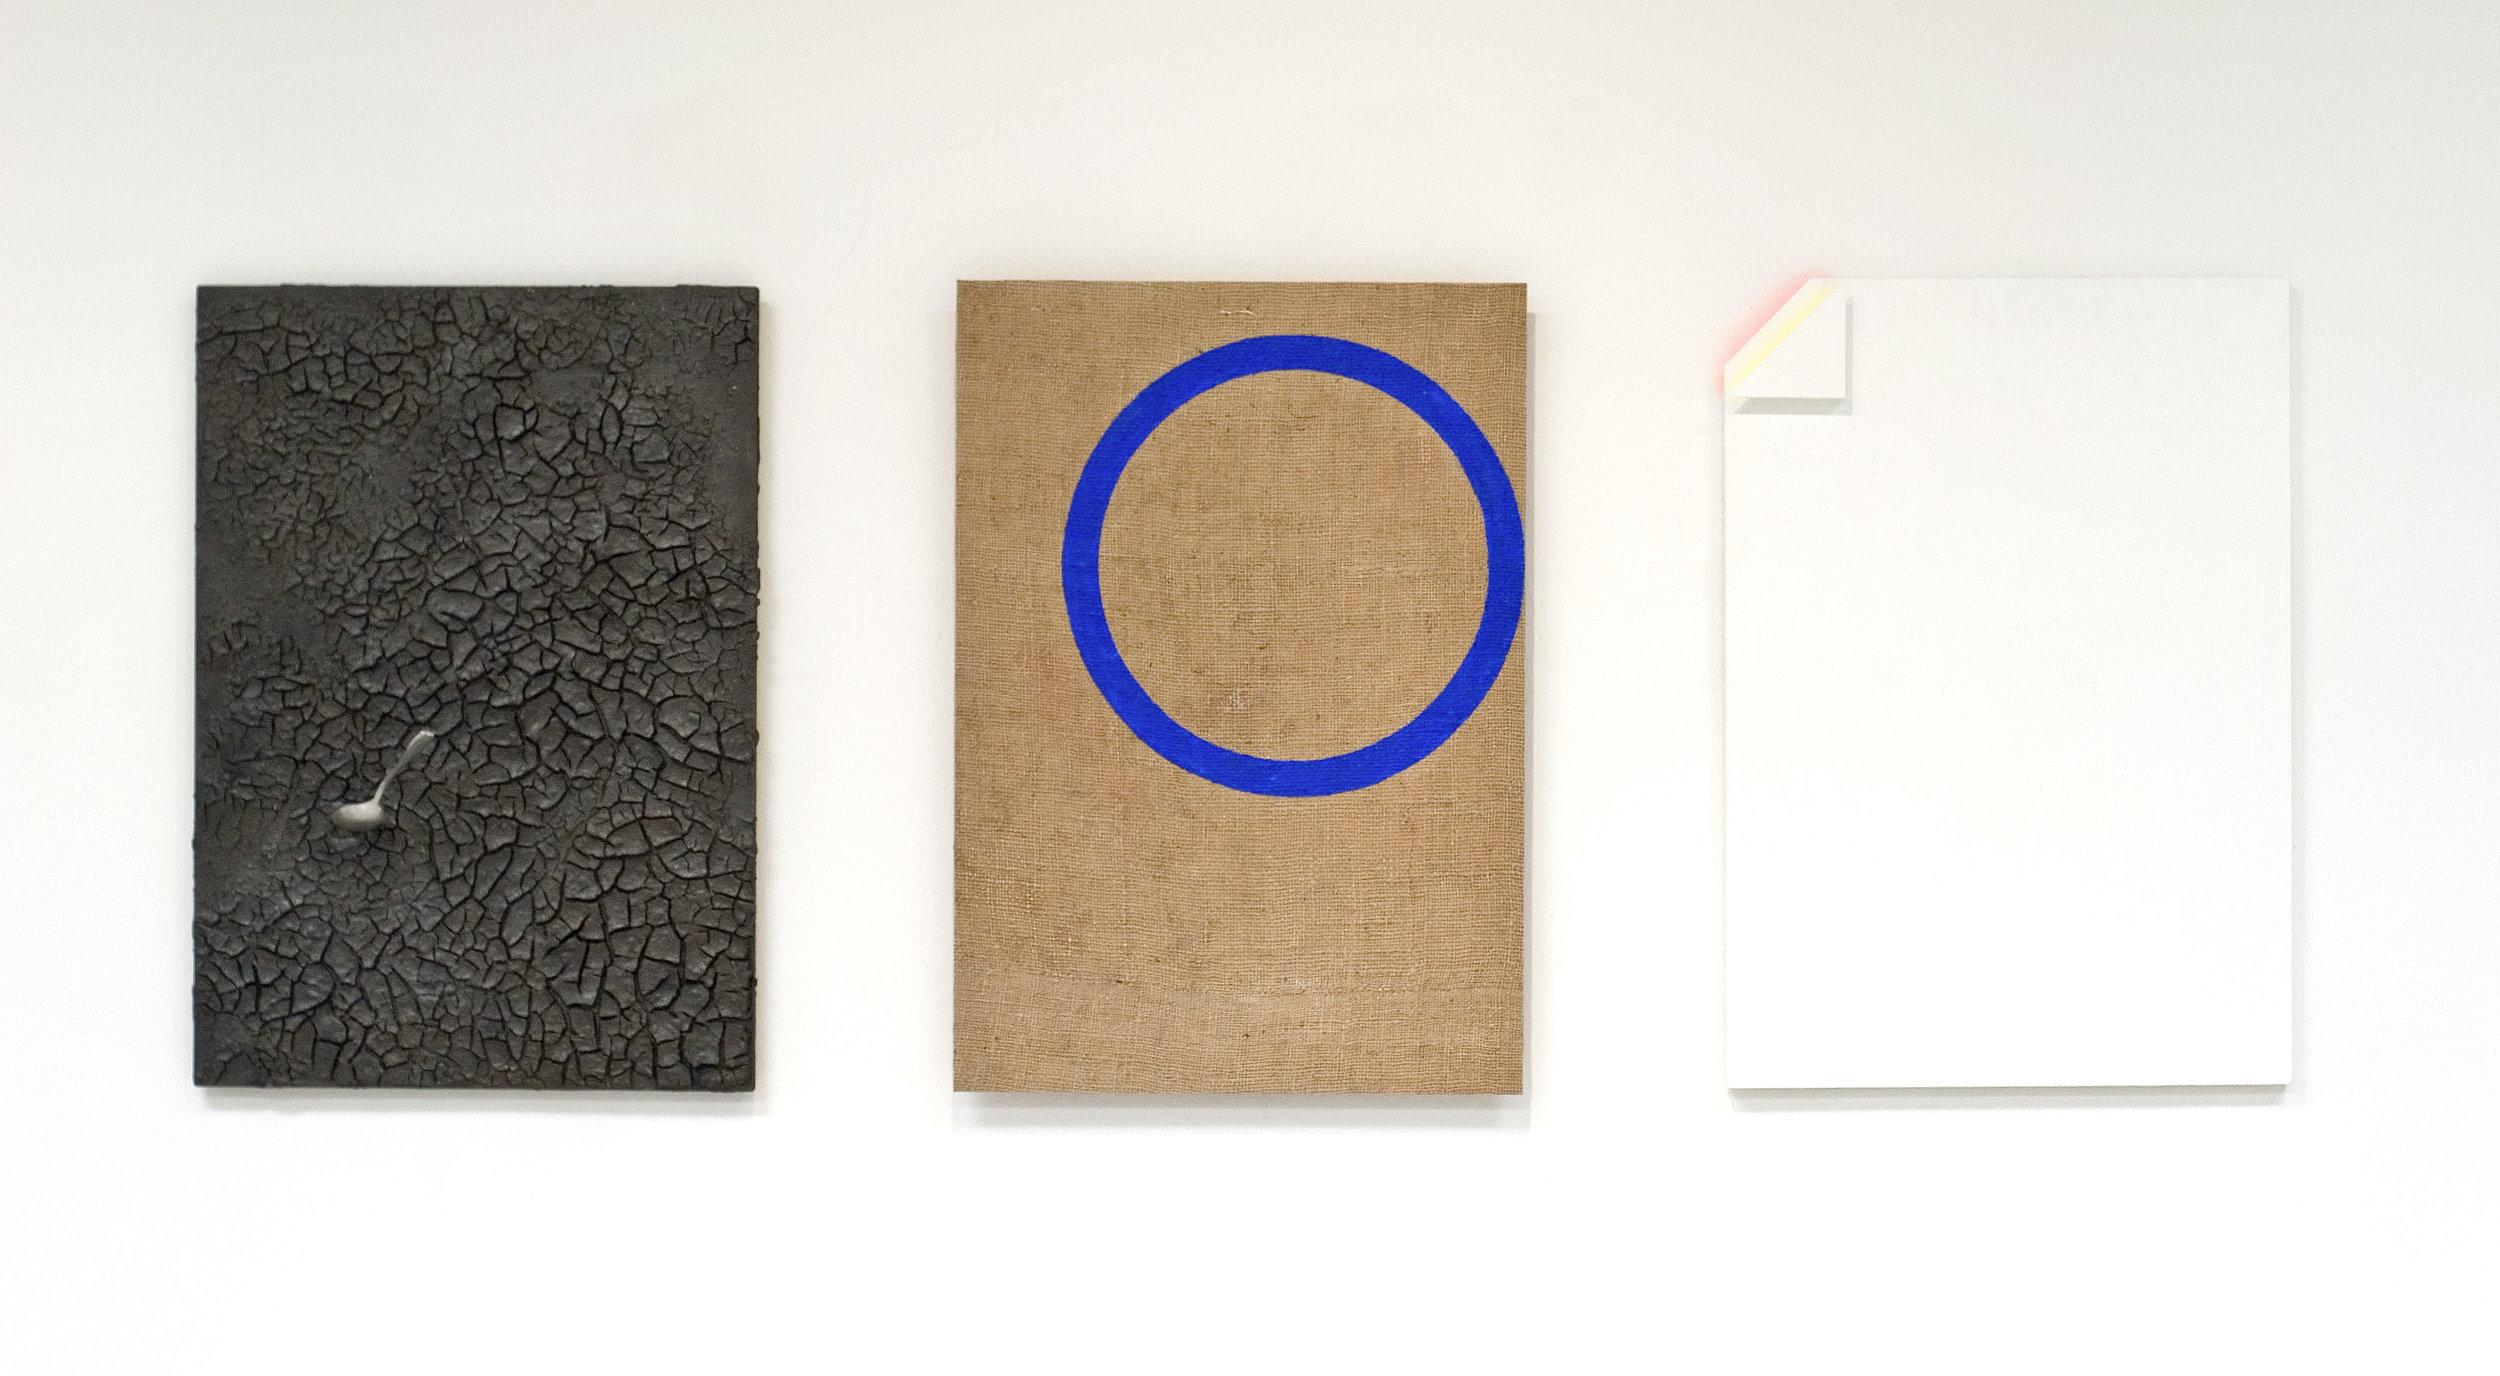 akril, zemlja, aluminij, les, trikrat 30 x 45 cm, 2003